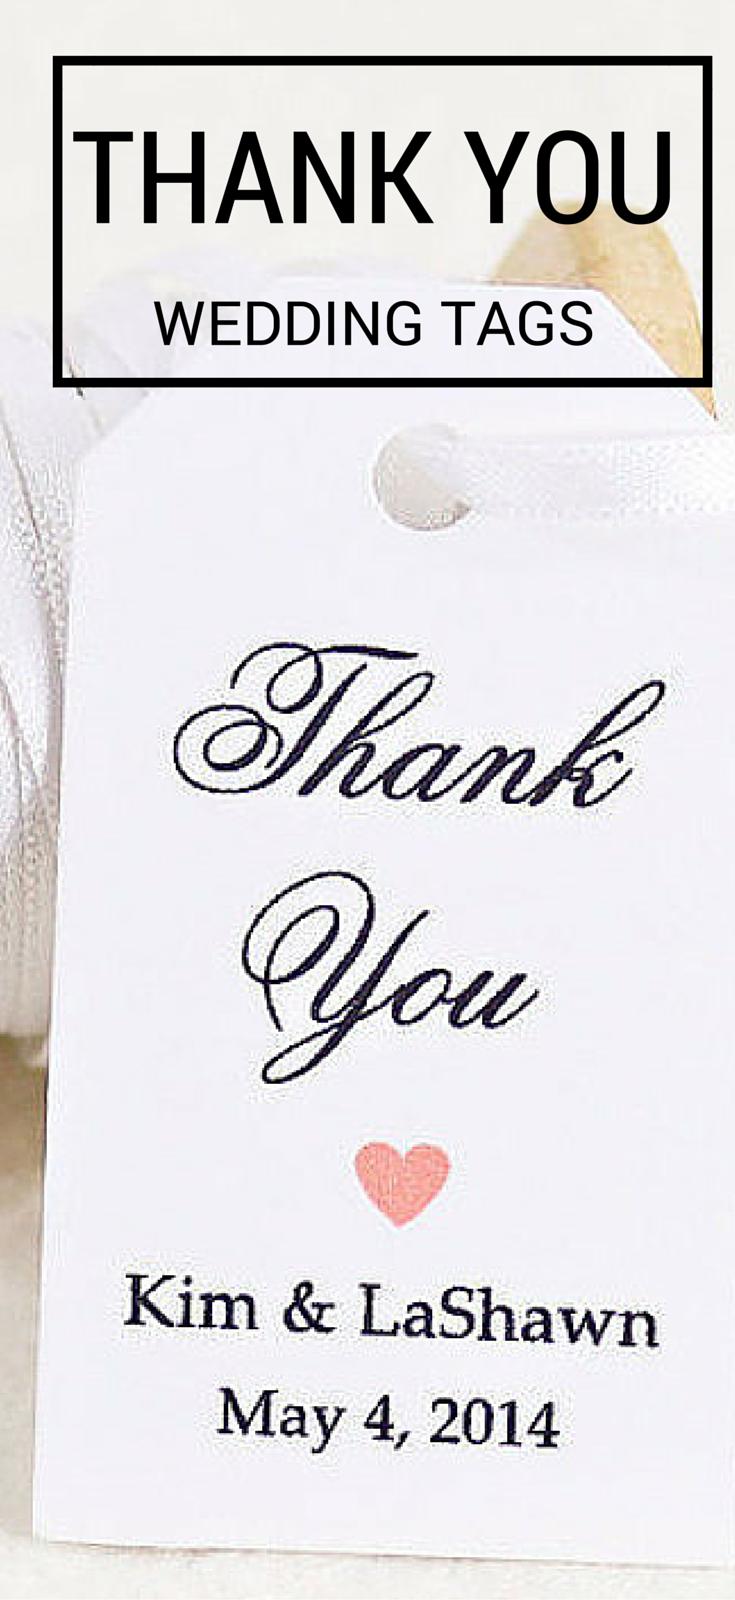 Wedding Thank You Tag, Elegant Formal Wedding Favor Tag with Names ...